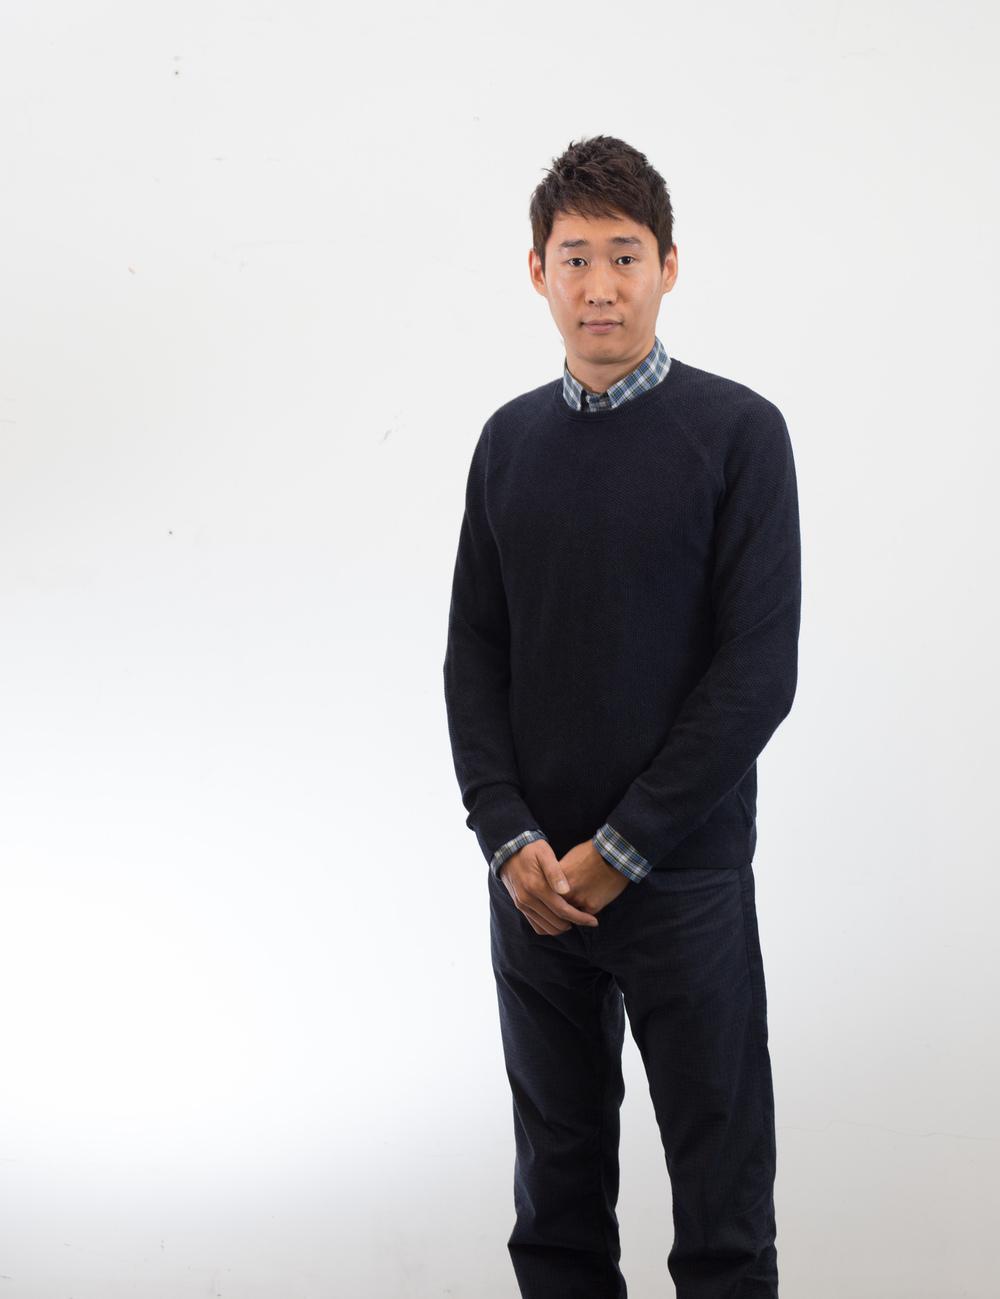 Jamie Lim / Architectural Technician